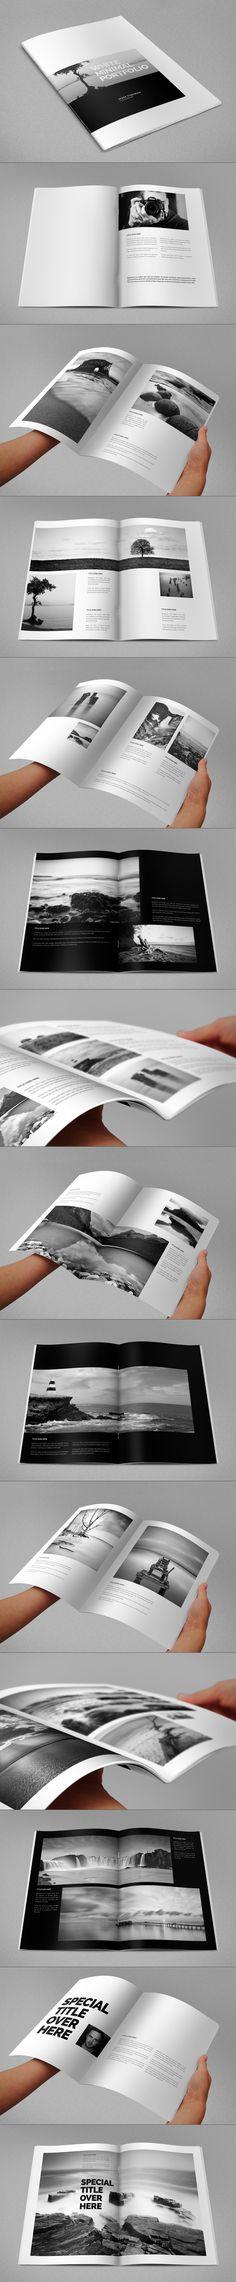 White Minimal Portfolio. Download here: http://graphicriver.net/item/white-minimal-portfolio/8325211?ref=abradesign #design #brochure #portfolio